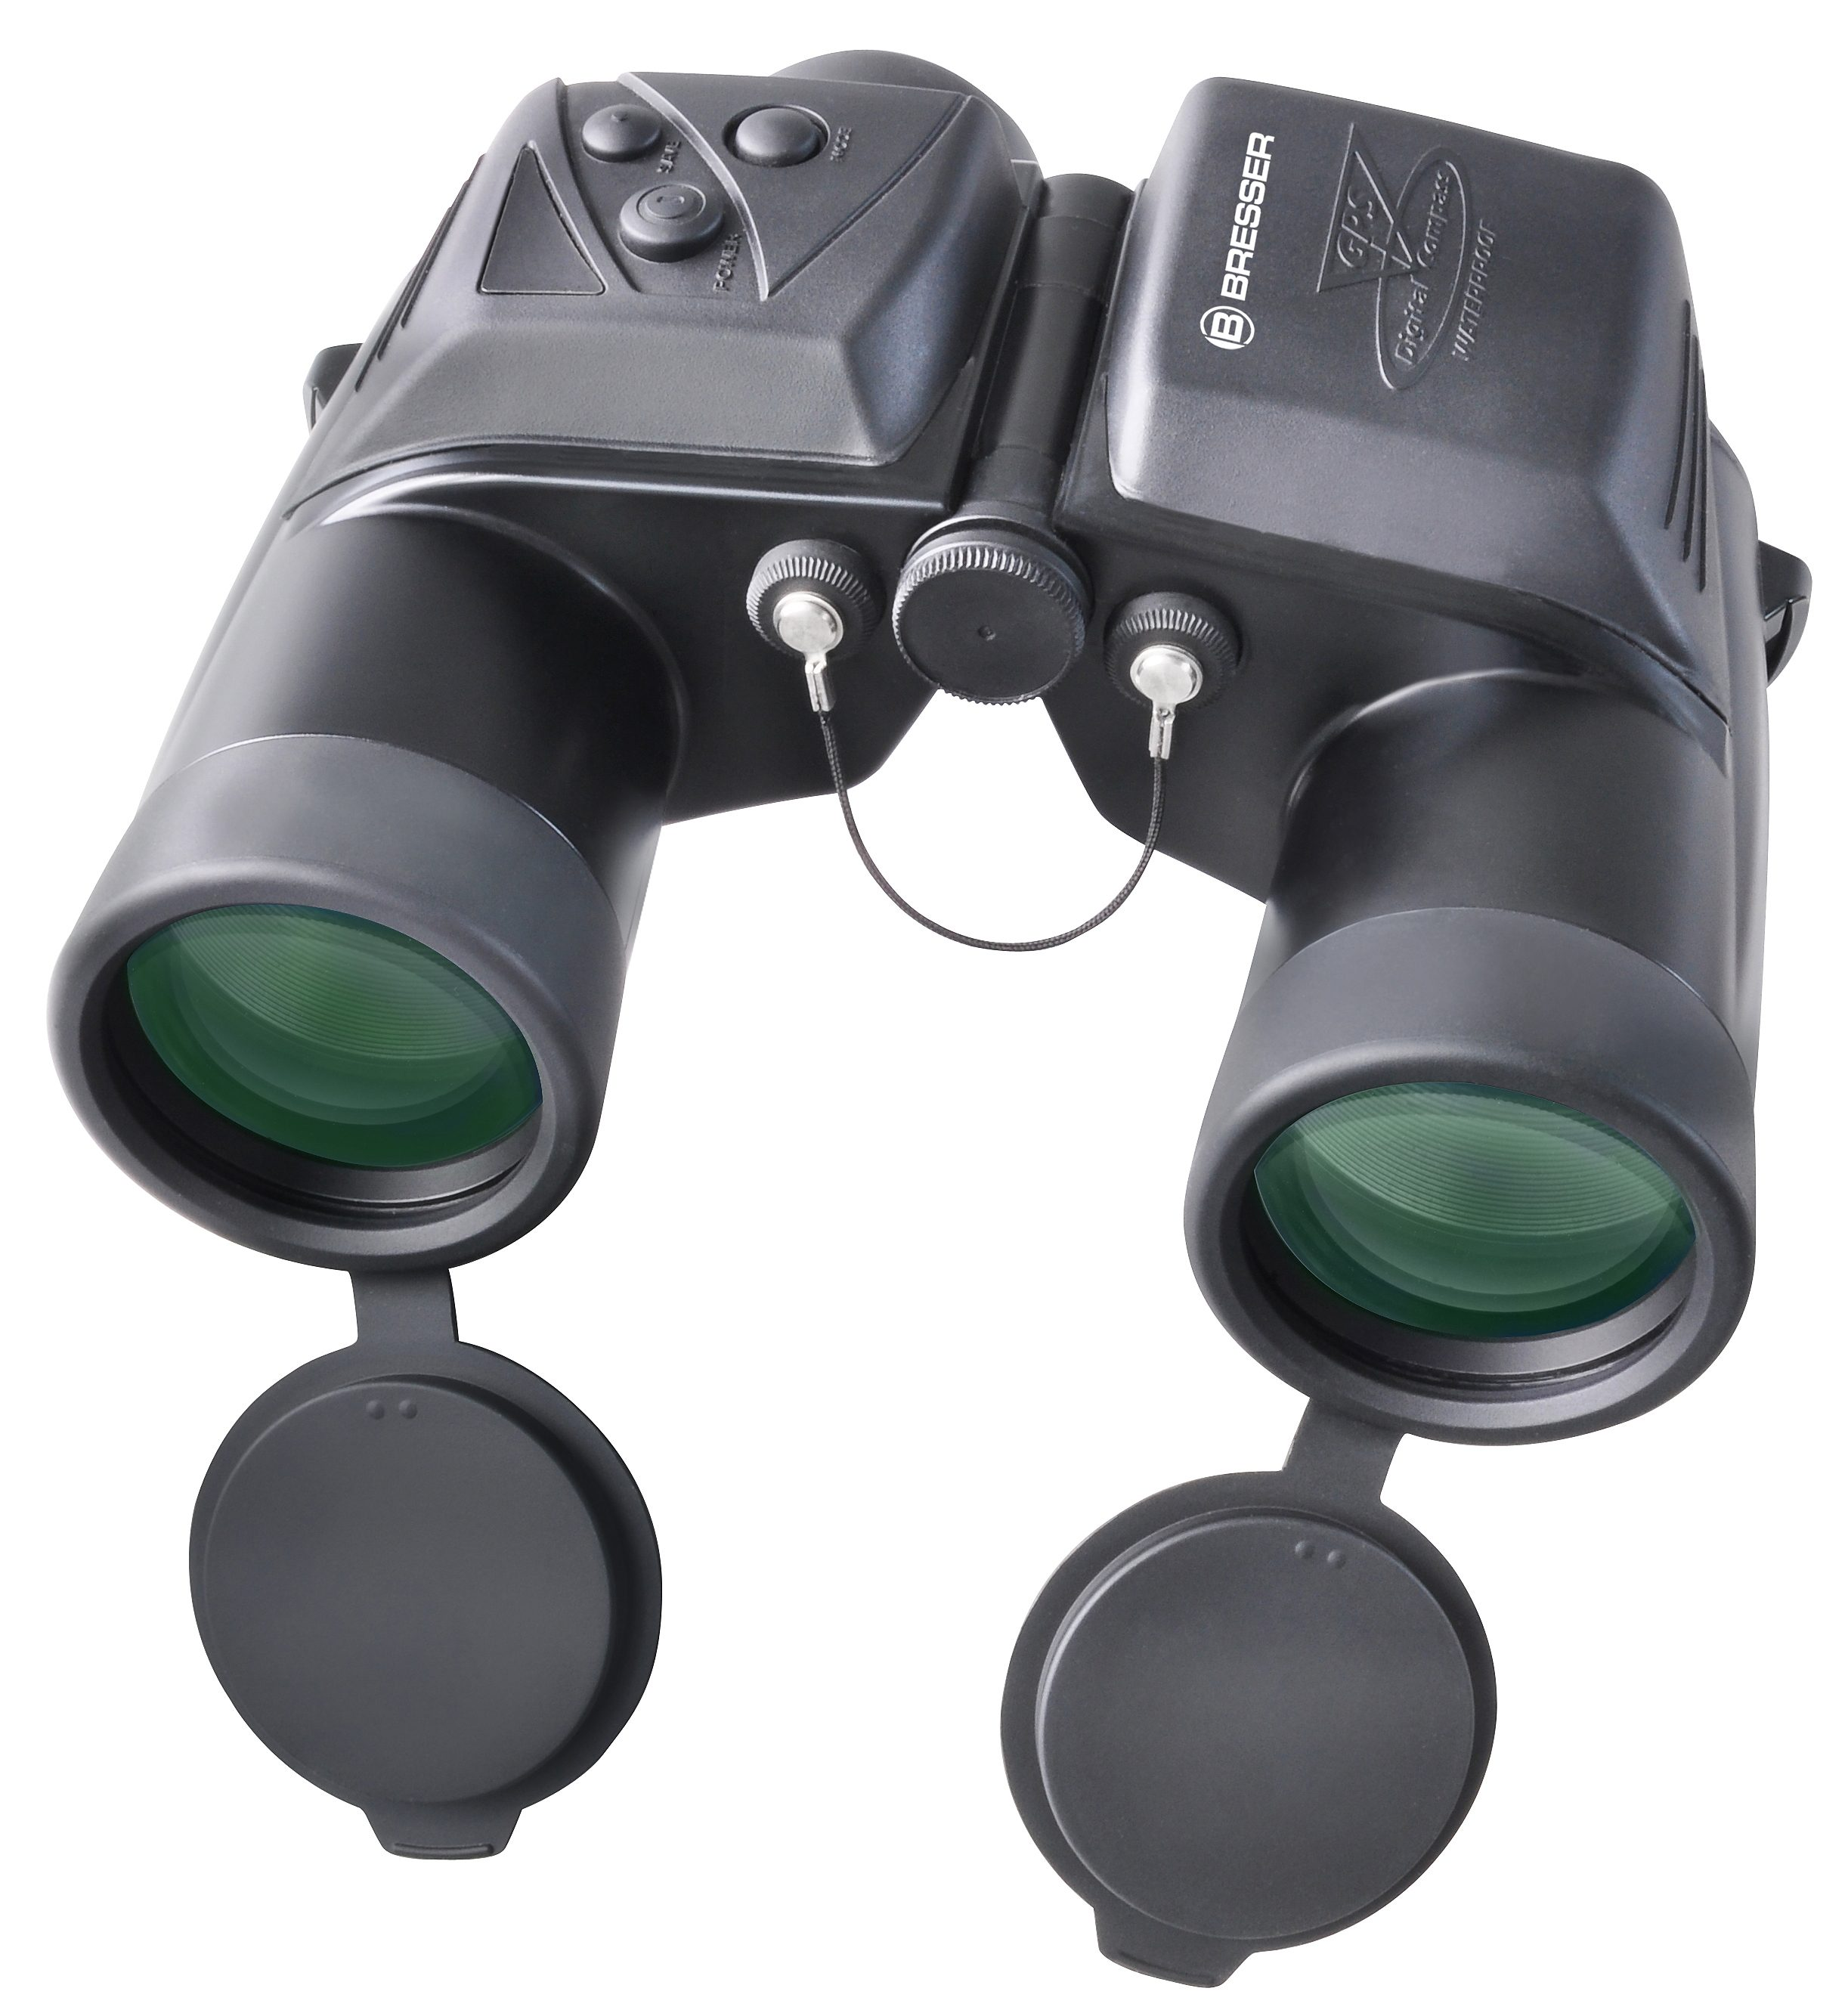 BRESSER Fernglas »BRESSER GPS-Fernglas 7x50«